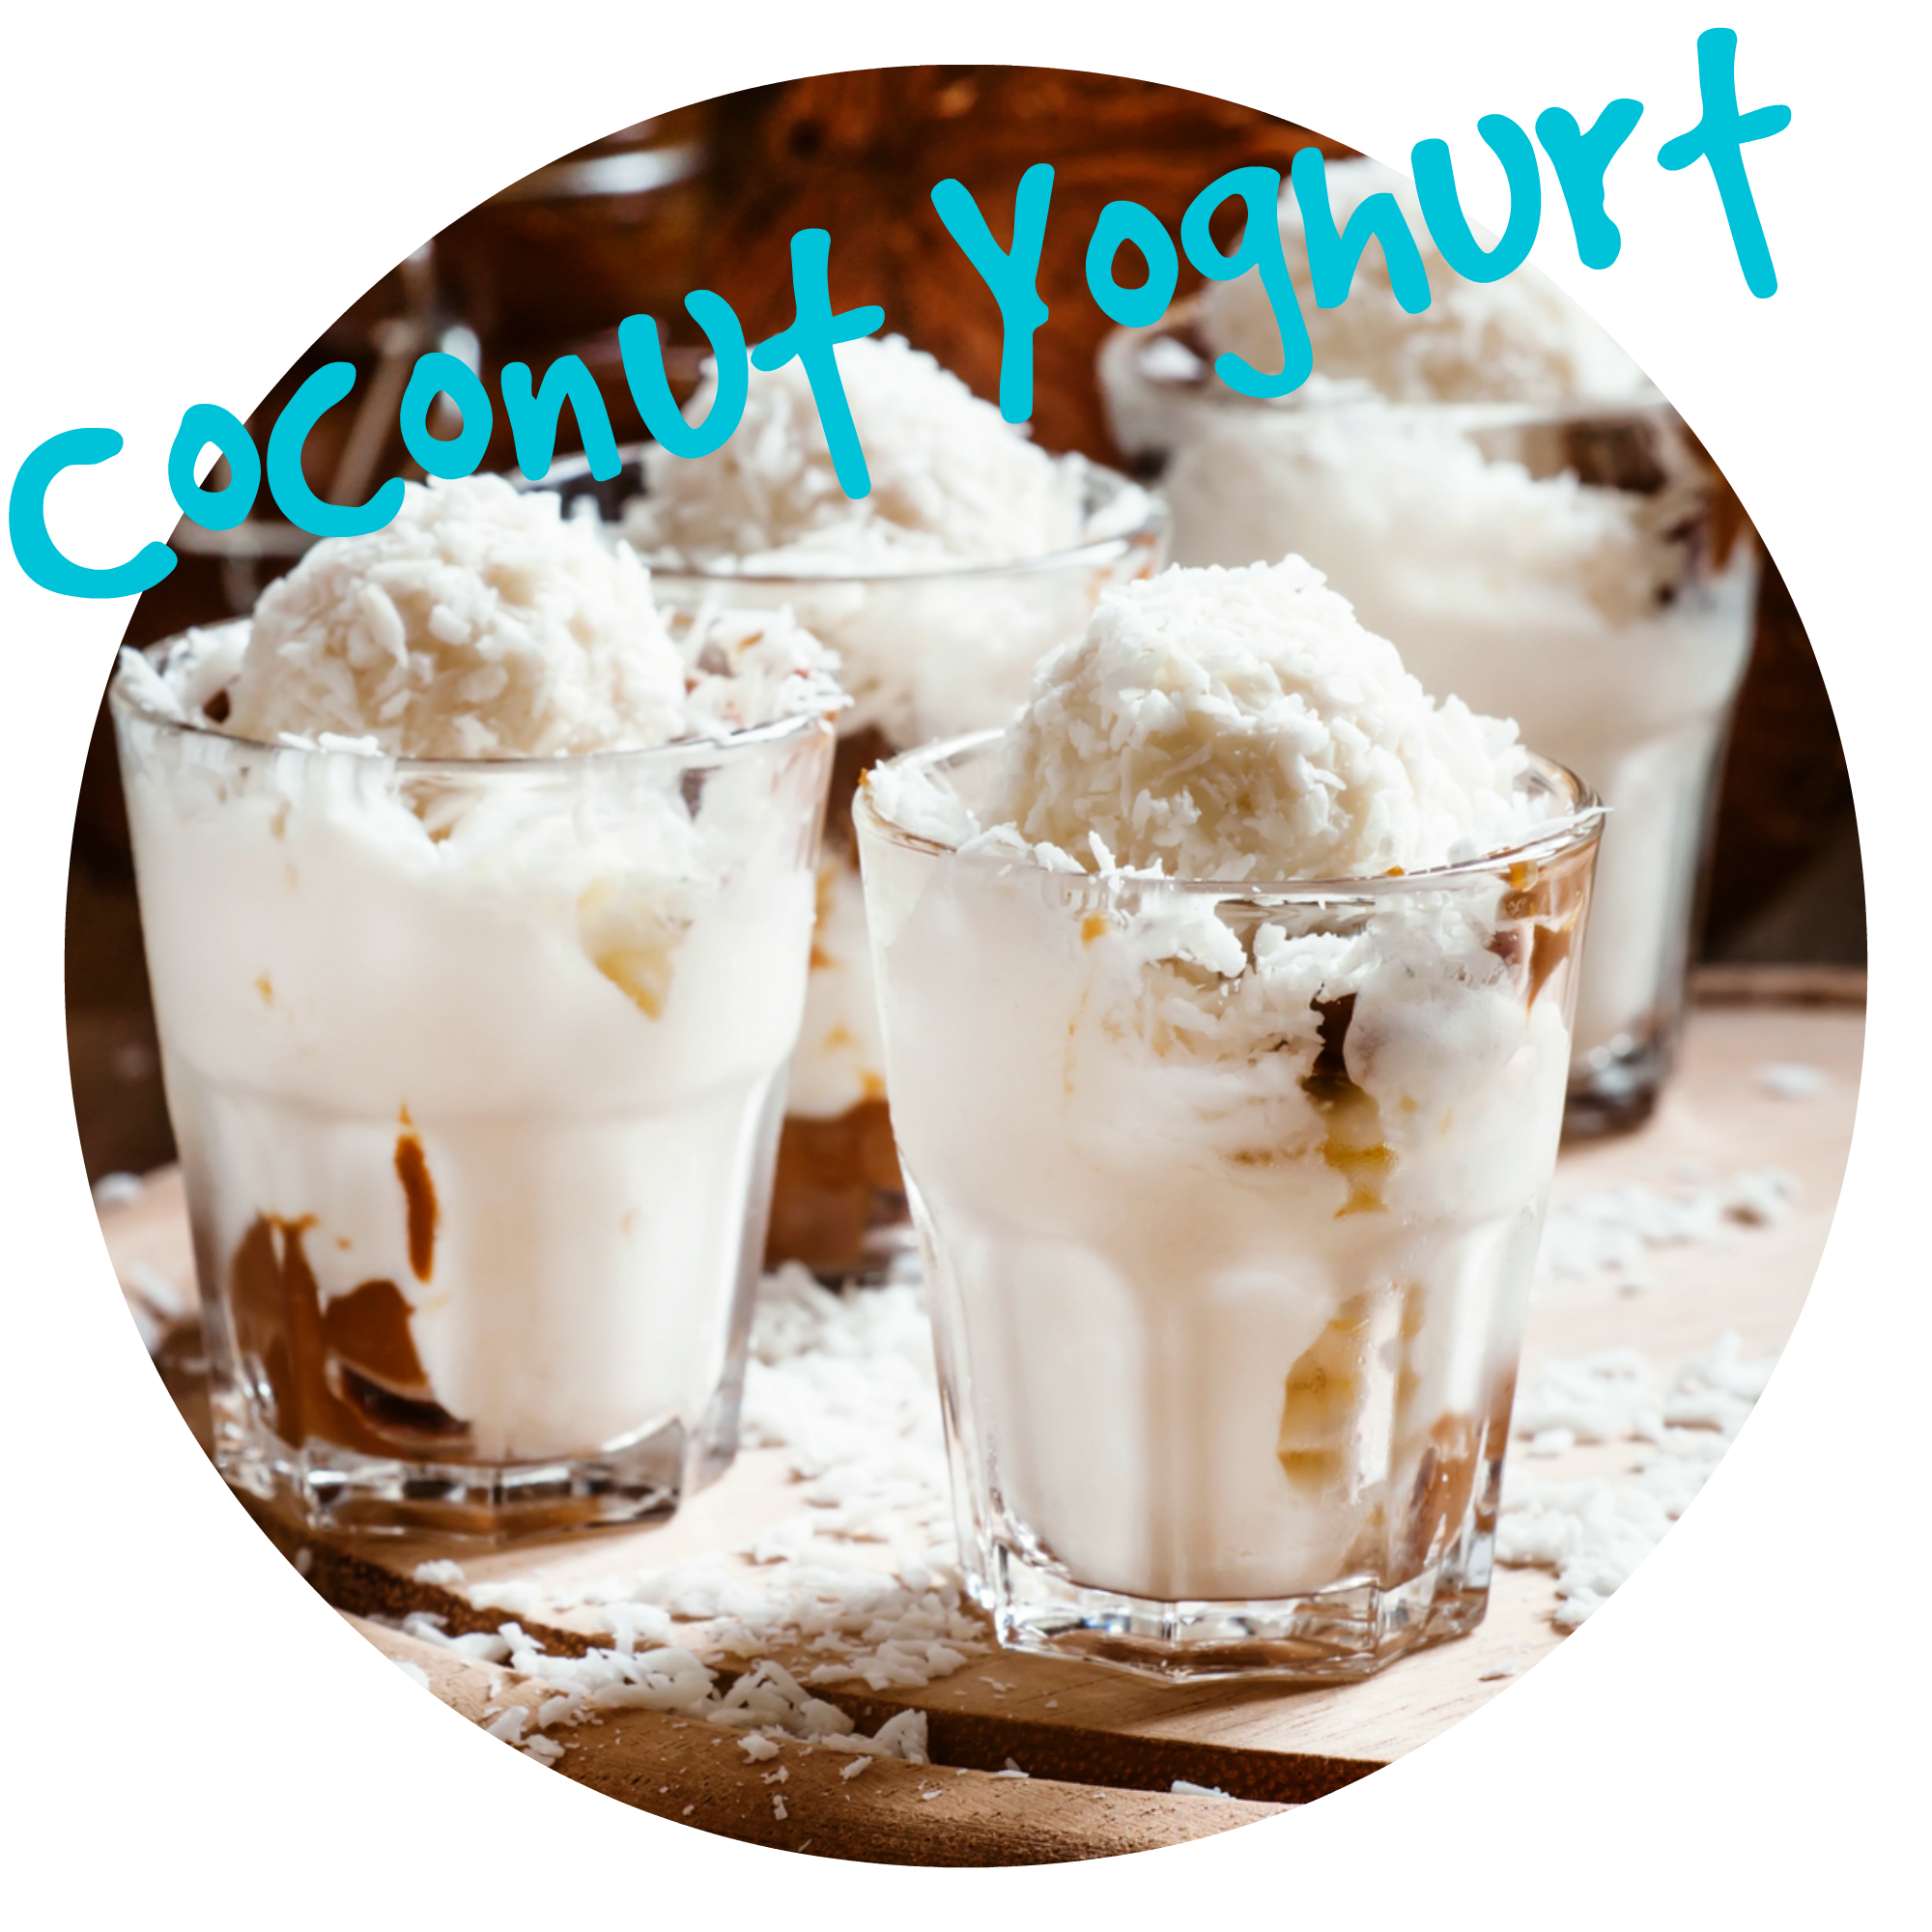 coconut-yoghurt.png